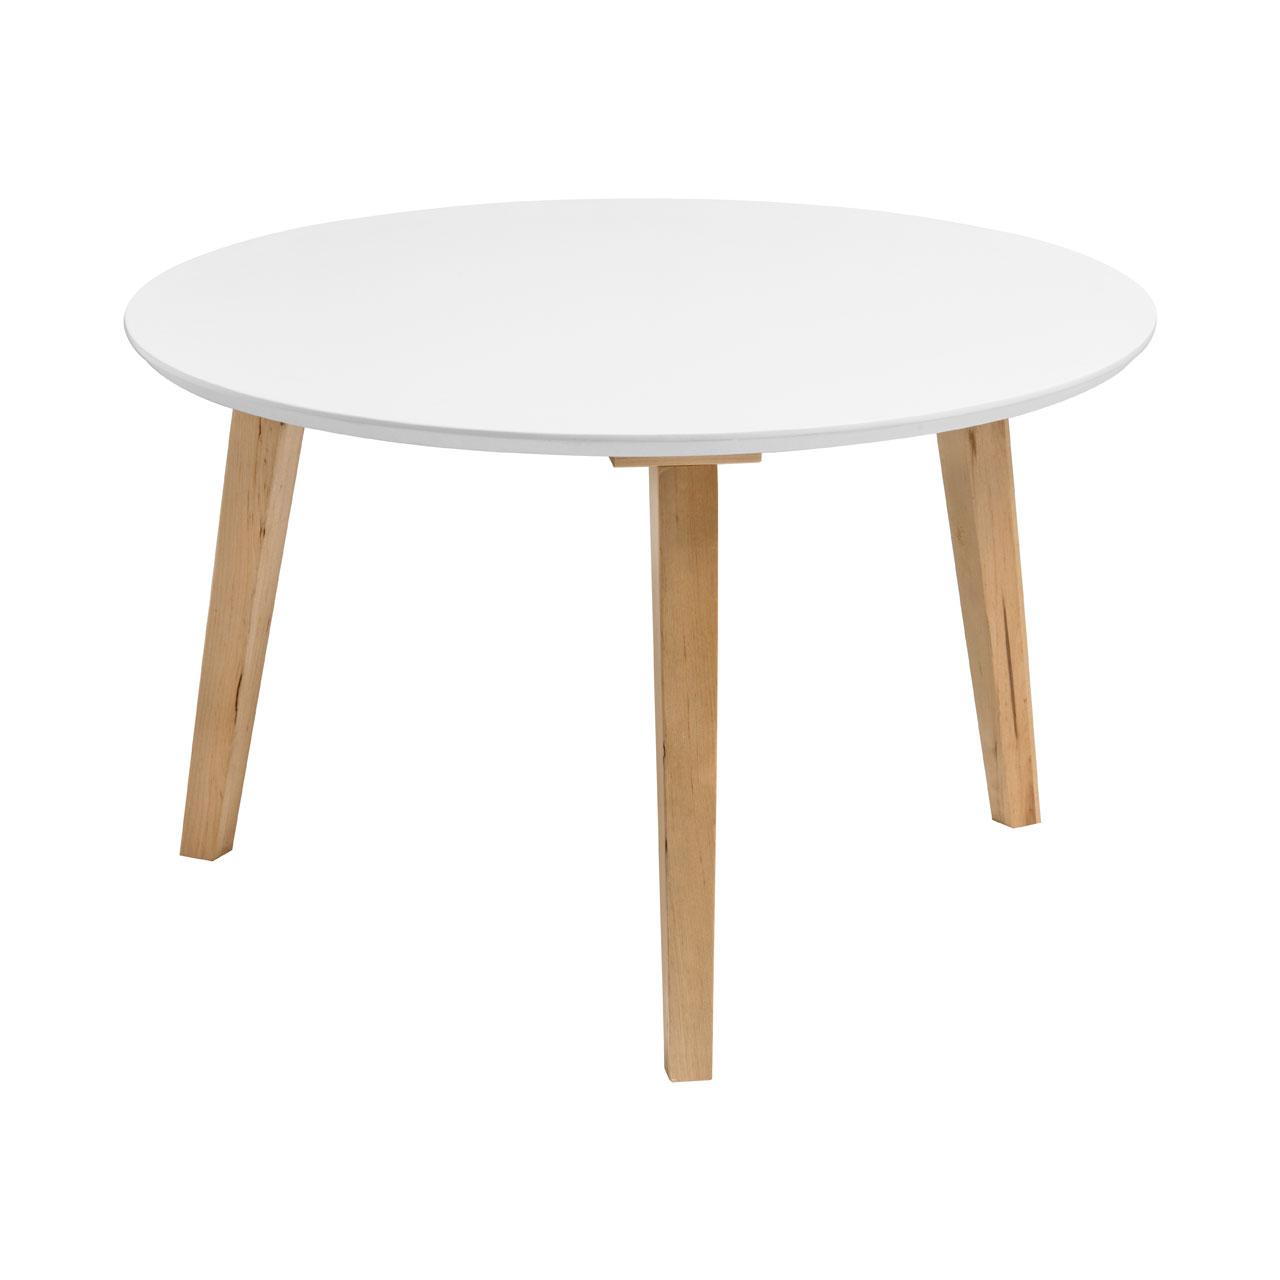 Fiesta Coffee Table, White/Birch Frame | eBay